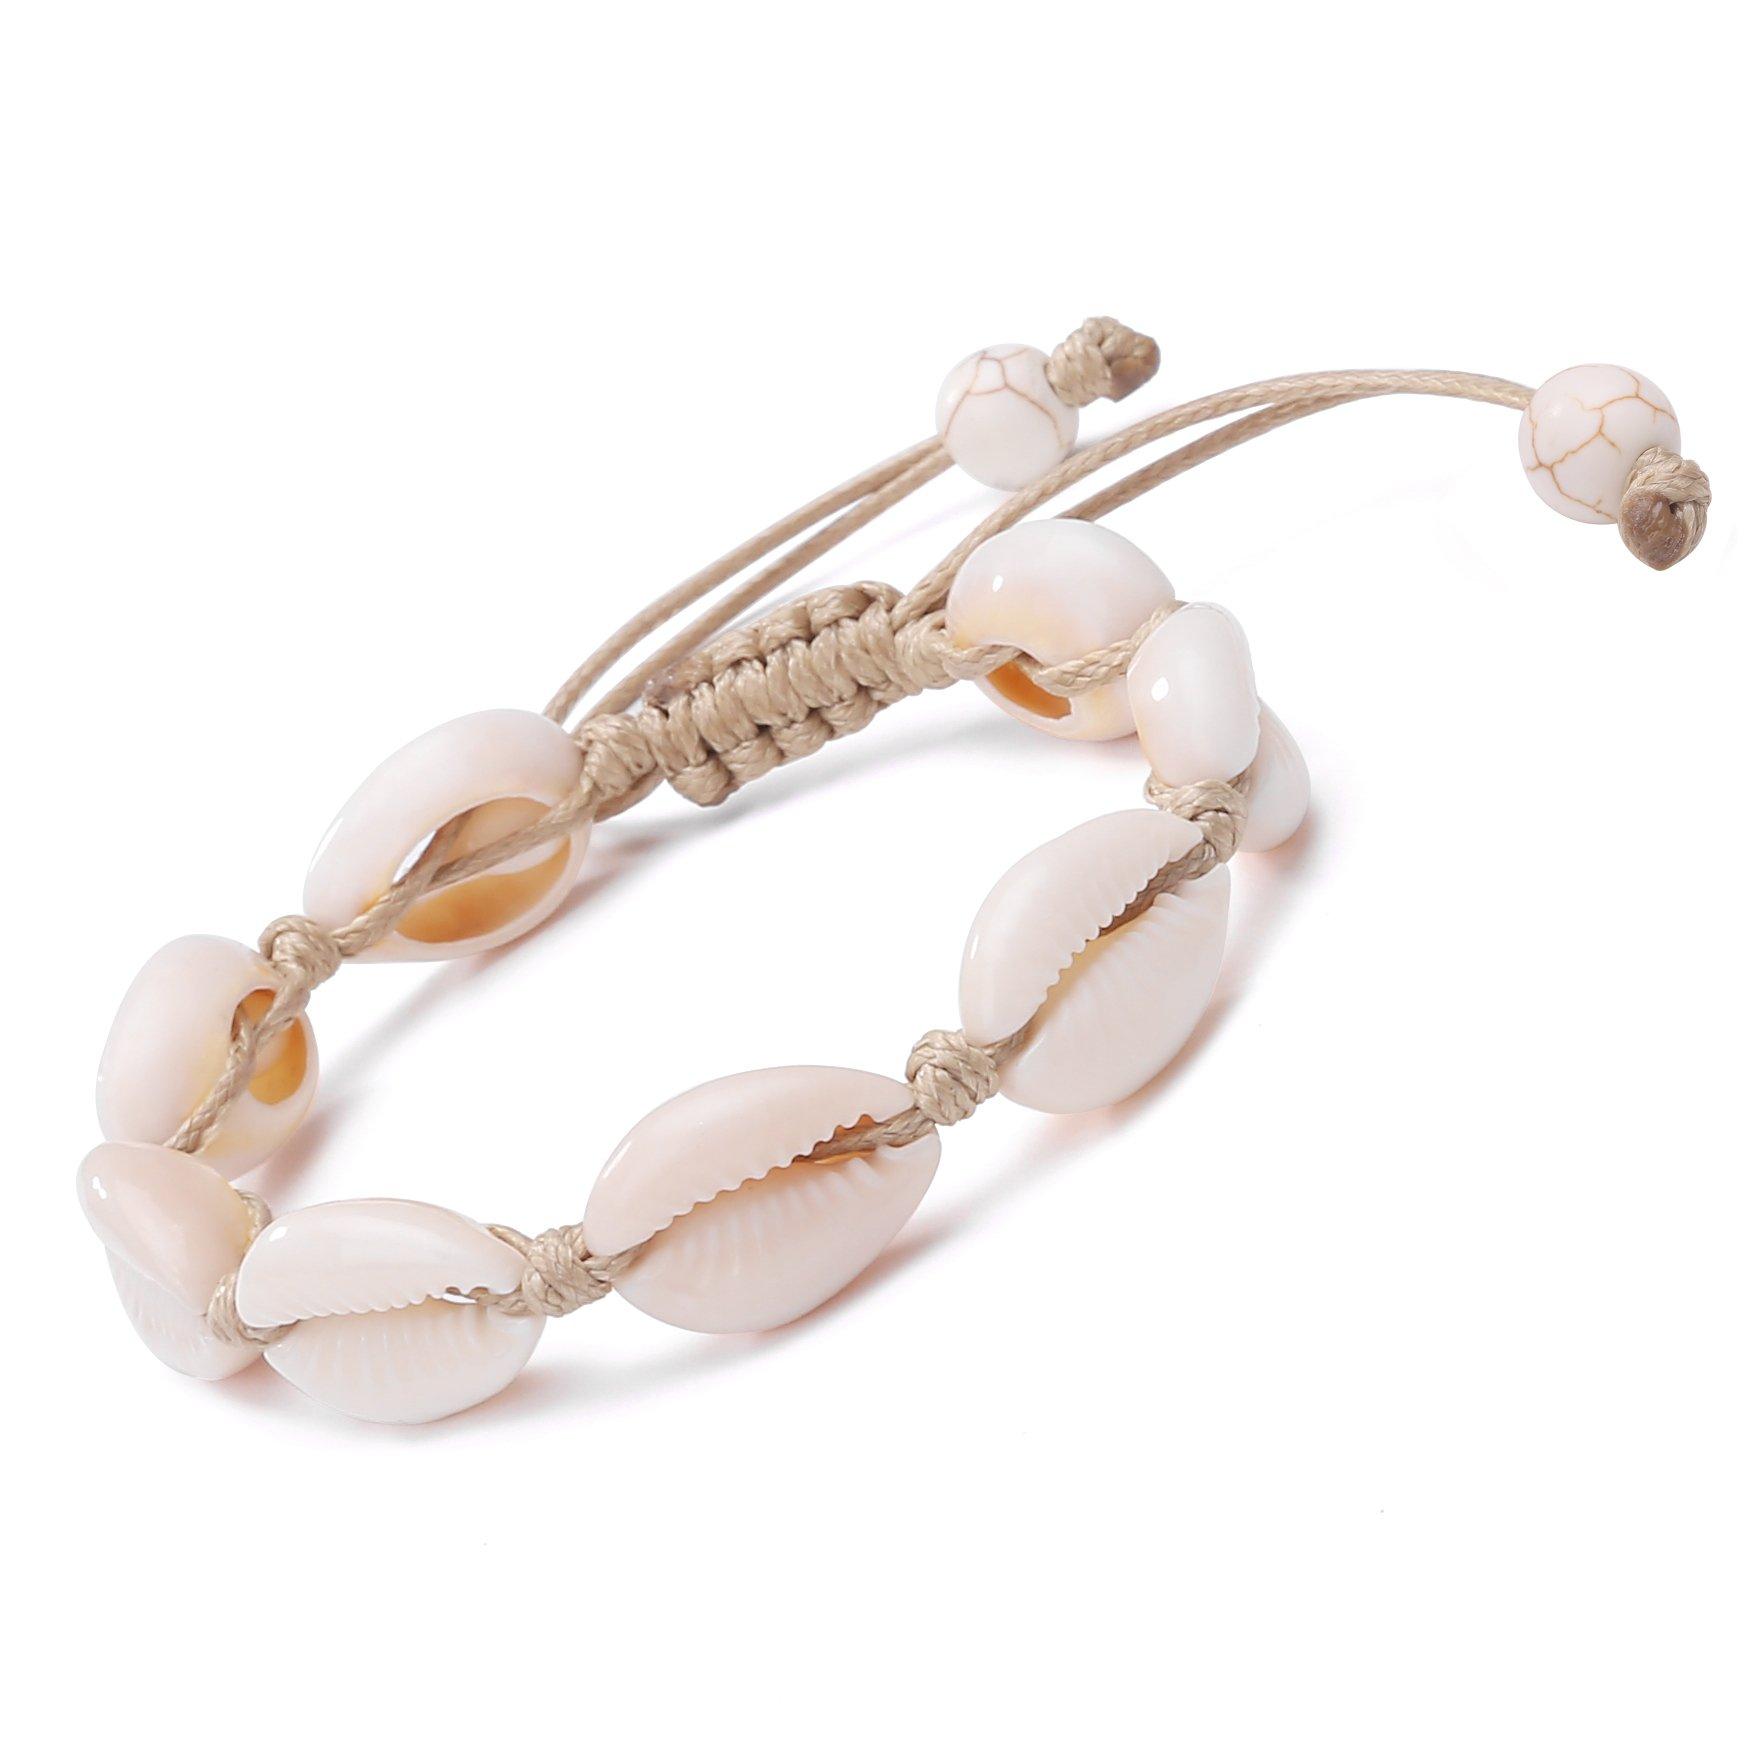 POTESSA Natural Cowrie Bead Shell Bracelet Hawaiian Jamaican Style Adjustable Beach Surfer Jewelry Macrame Bracelets for Women Girls by POTESSA